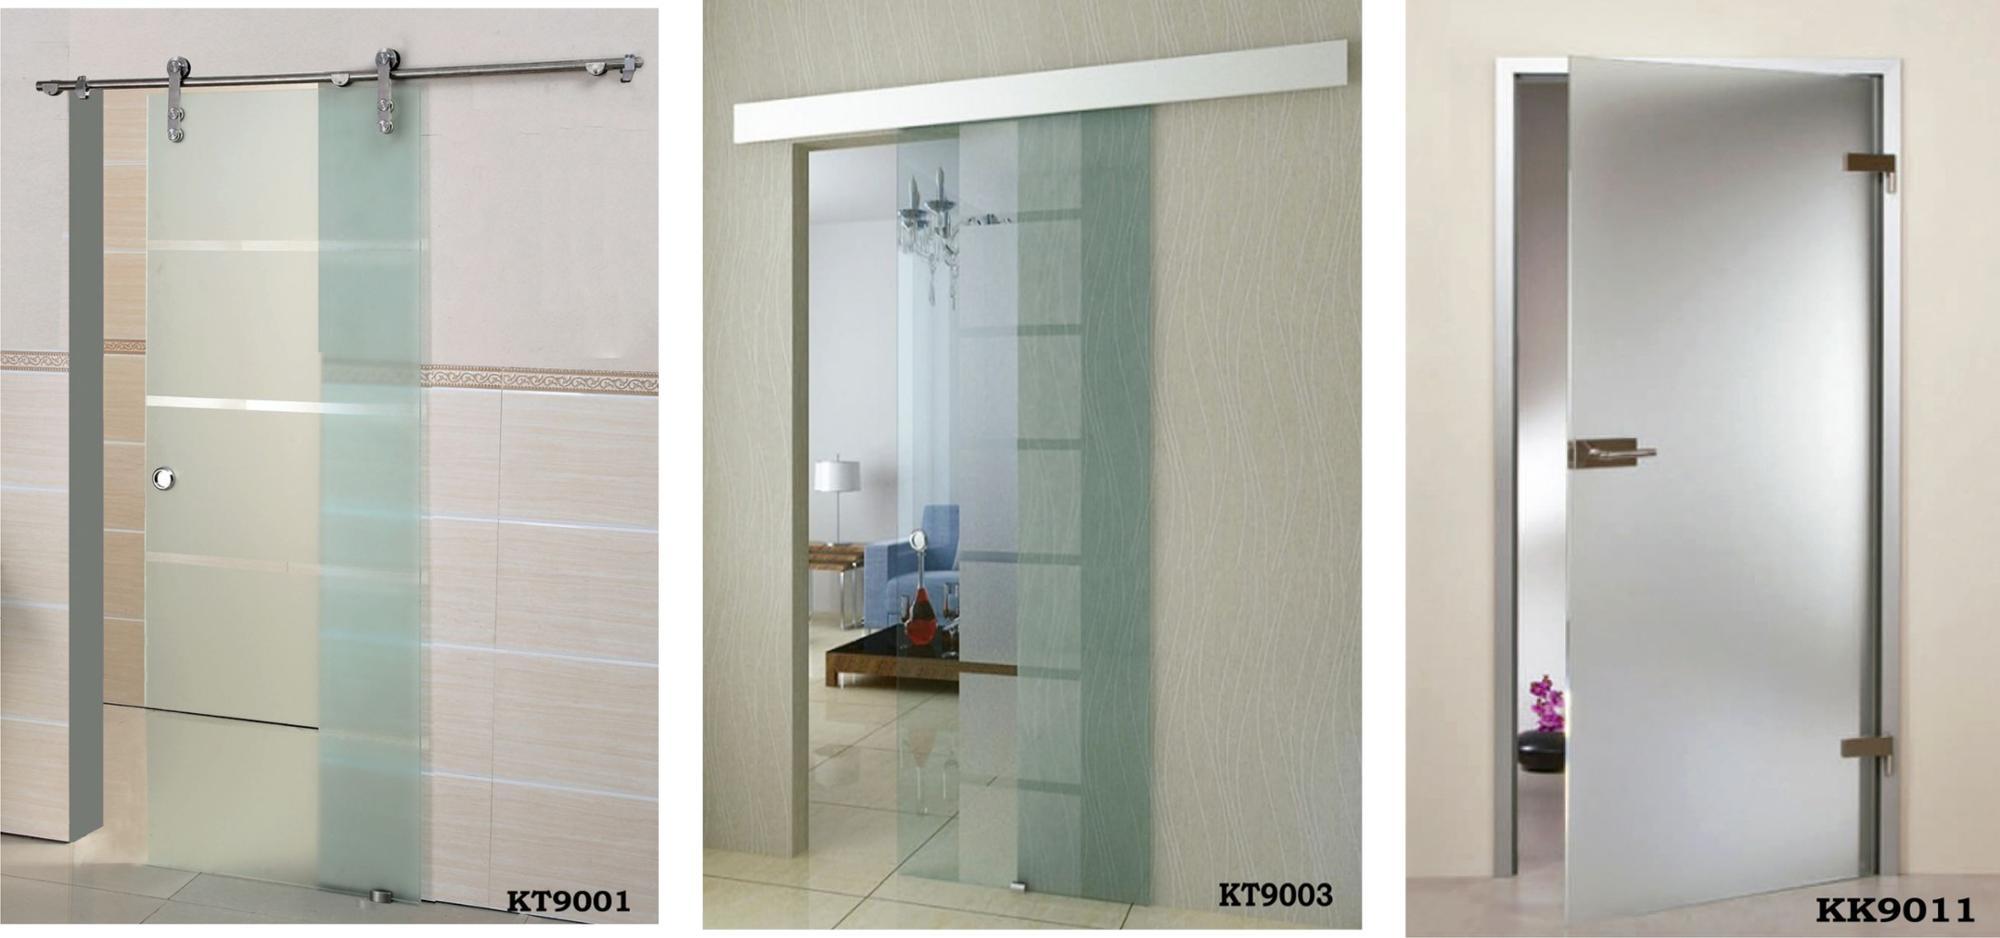 Puertas de baño de entrada de vidrio con marco de aluminio (KT9003)